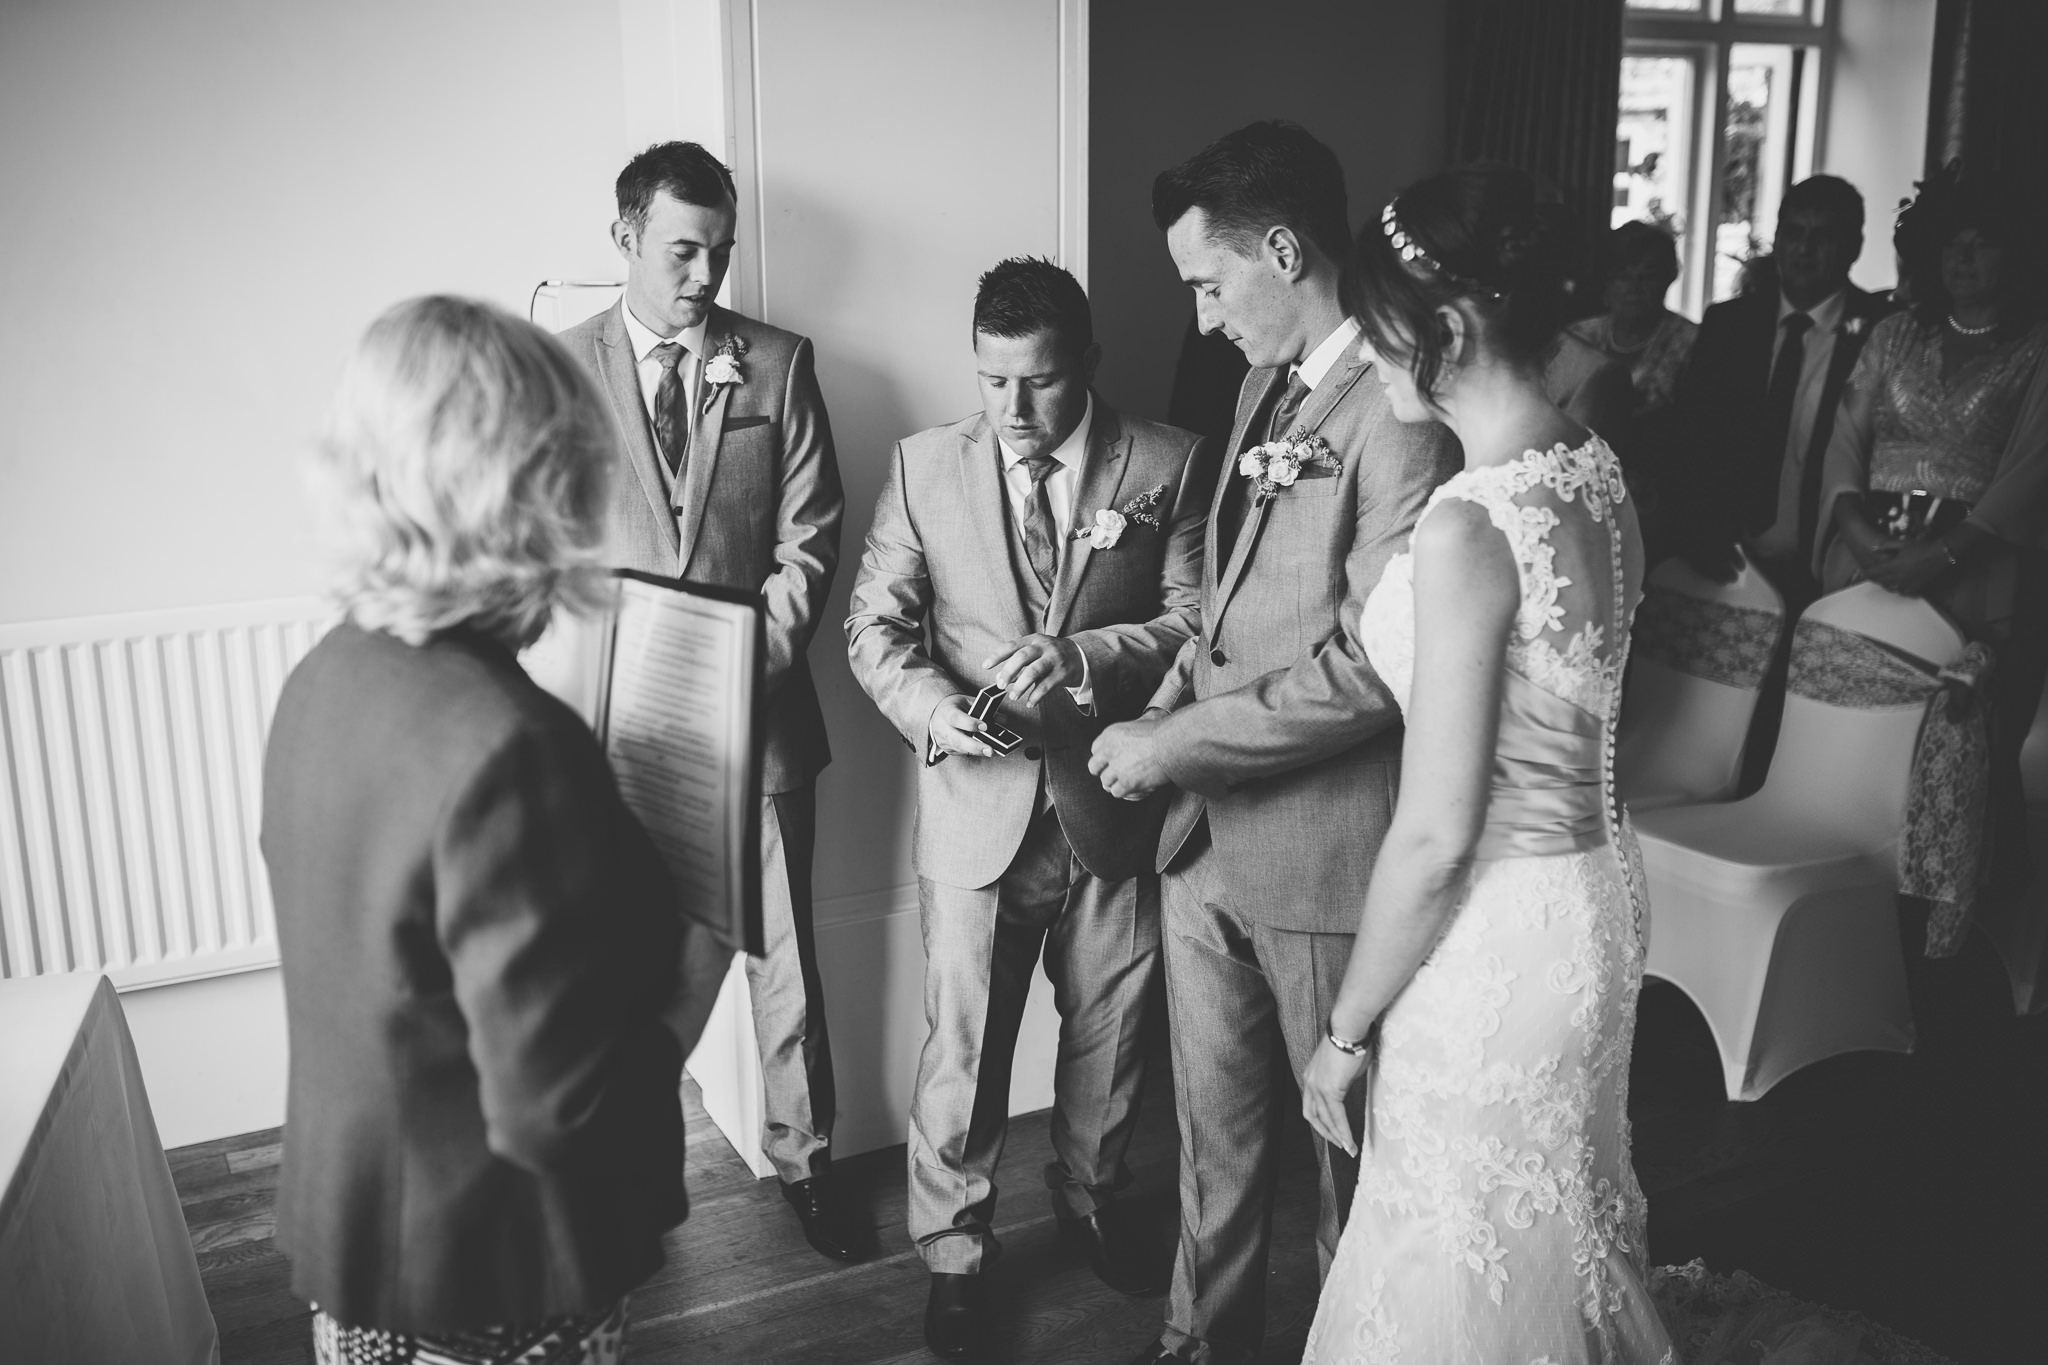 paul-marbrook-Caer-Llan-Wedding-Photographer-90043